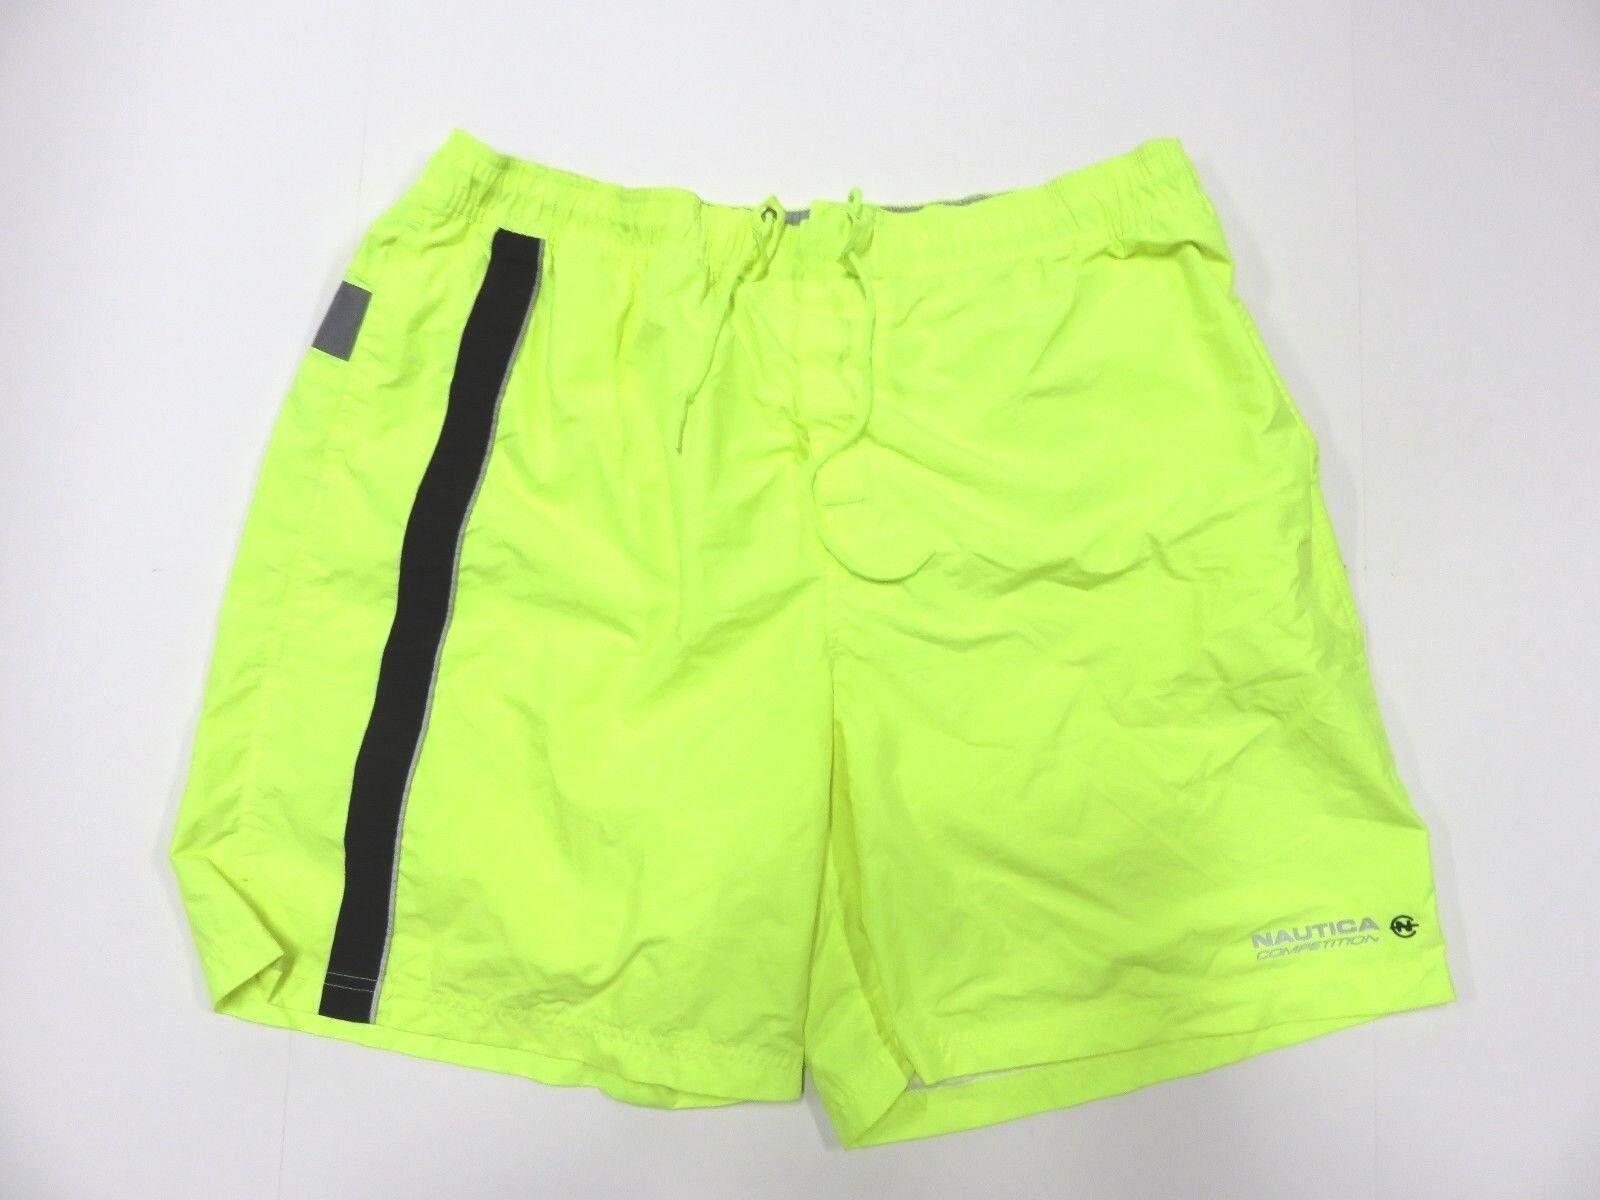 NAUTICA COMPETITION Neon Reflective Yellow Swim Trunks Mesh Inside Adult Sz XXL